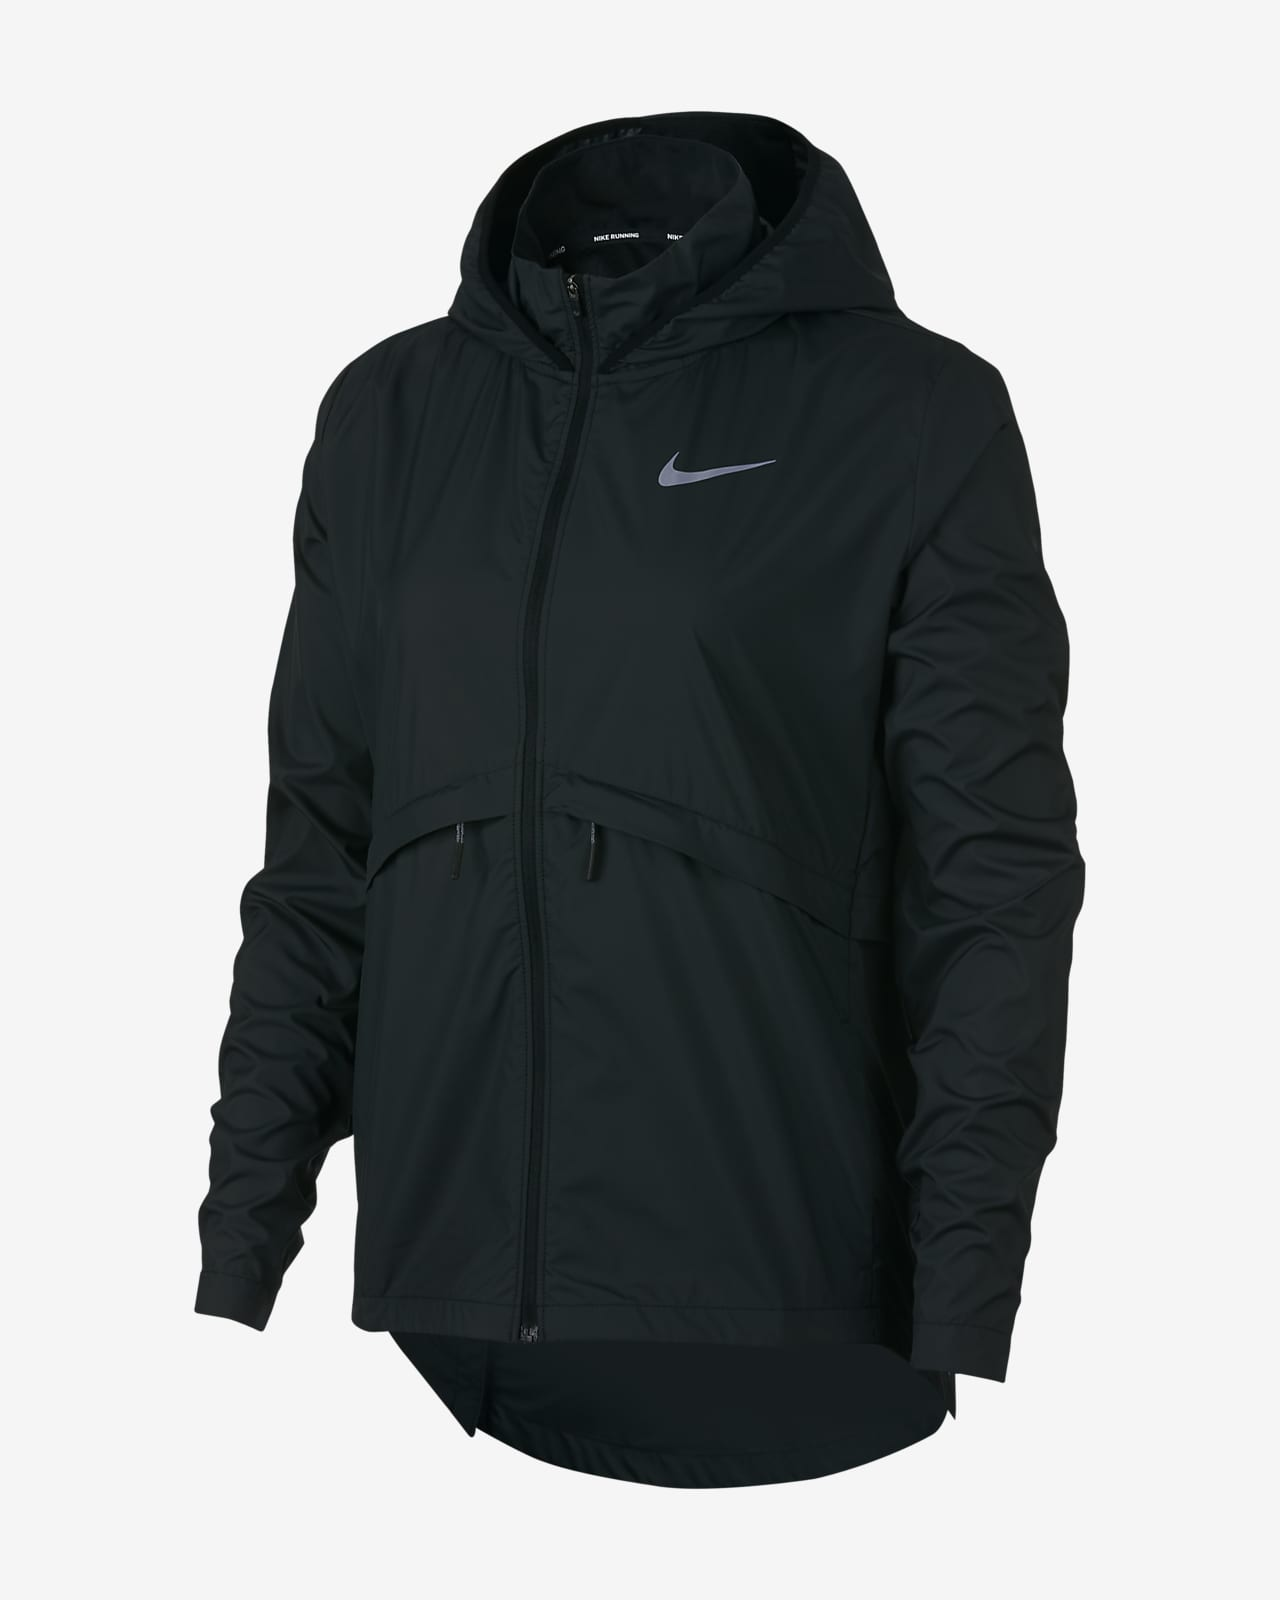 Nike Essential Women's Running Rain Jacket